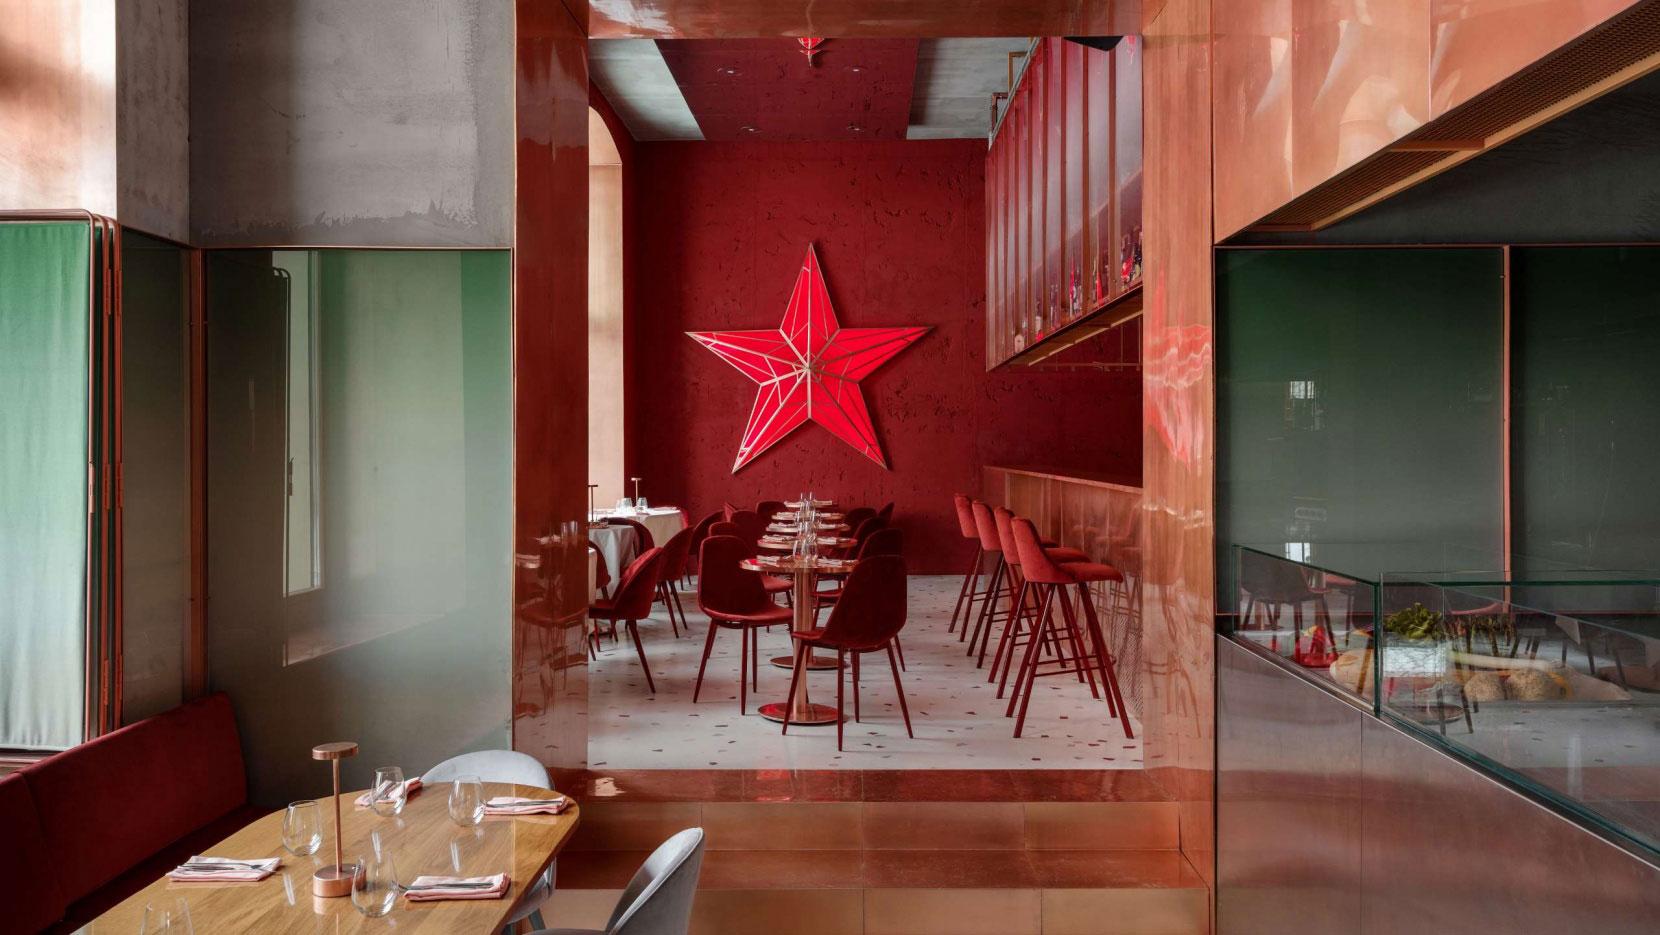 This Elegant, Stalin Era-Inspired Restaurant in Moscow Isn't Very Oppressive